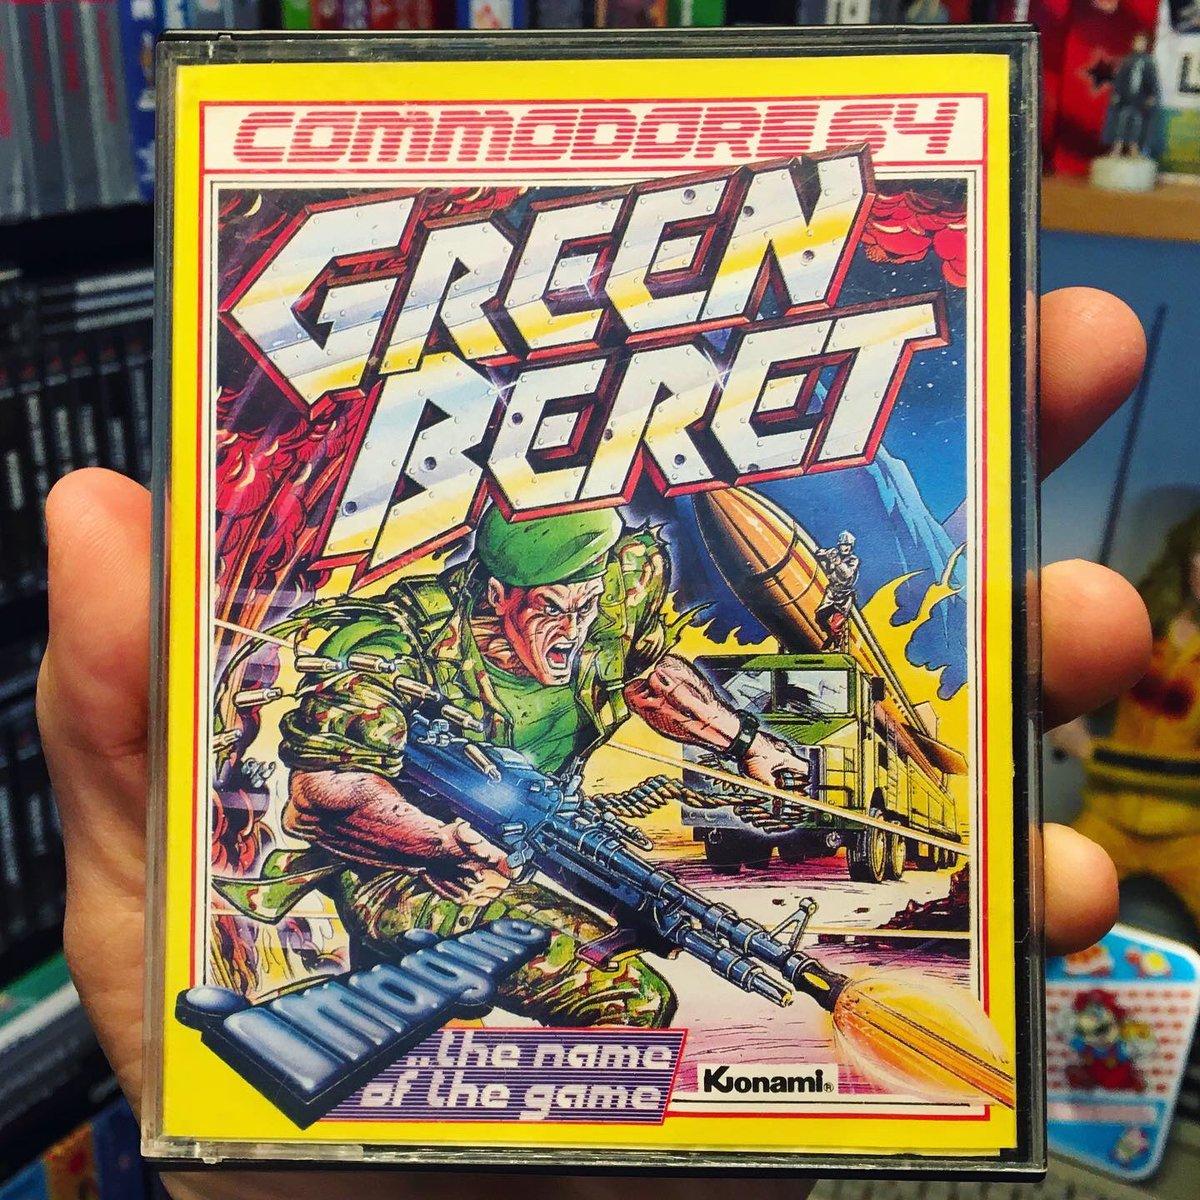 Green Beret - Konami - Commodore 64 Game - 1985 #retrogaming #retrogames #retrogamer #gamer #gaming #greenberet #popculture #commodore64games #c64 #youtuber #1980s #8bit #gamecollection #gamerguy #collectibles #gameroom #commodore #videogames #konami #rushnattackpic.twitter.com/pP2g7J63R9